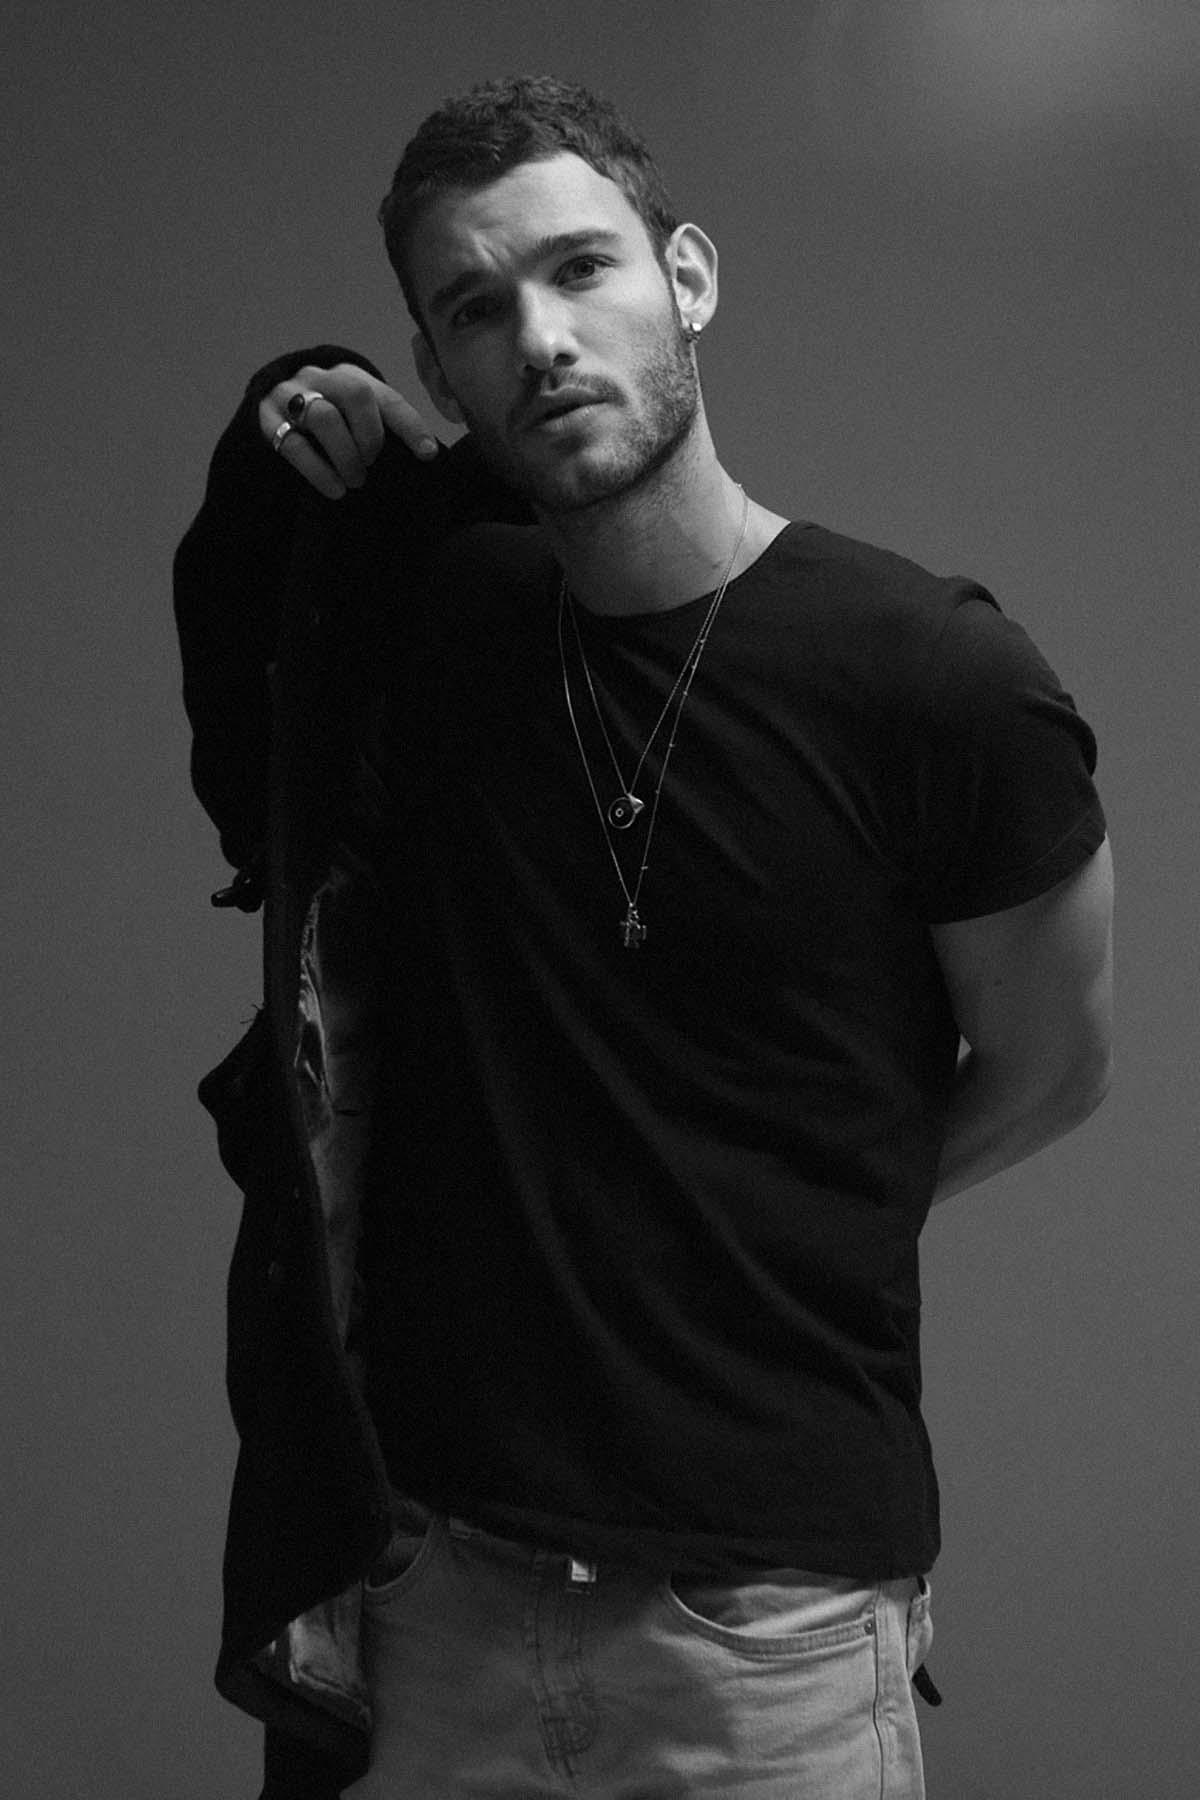 Luigi Ficarelli by Darren Black for Brazilian Male Model